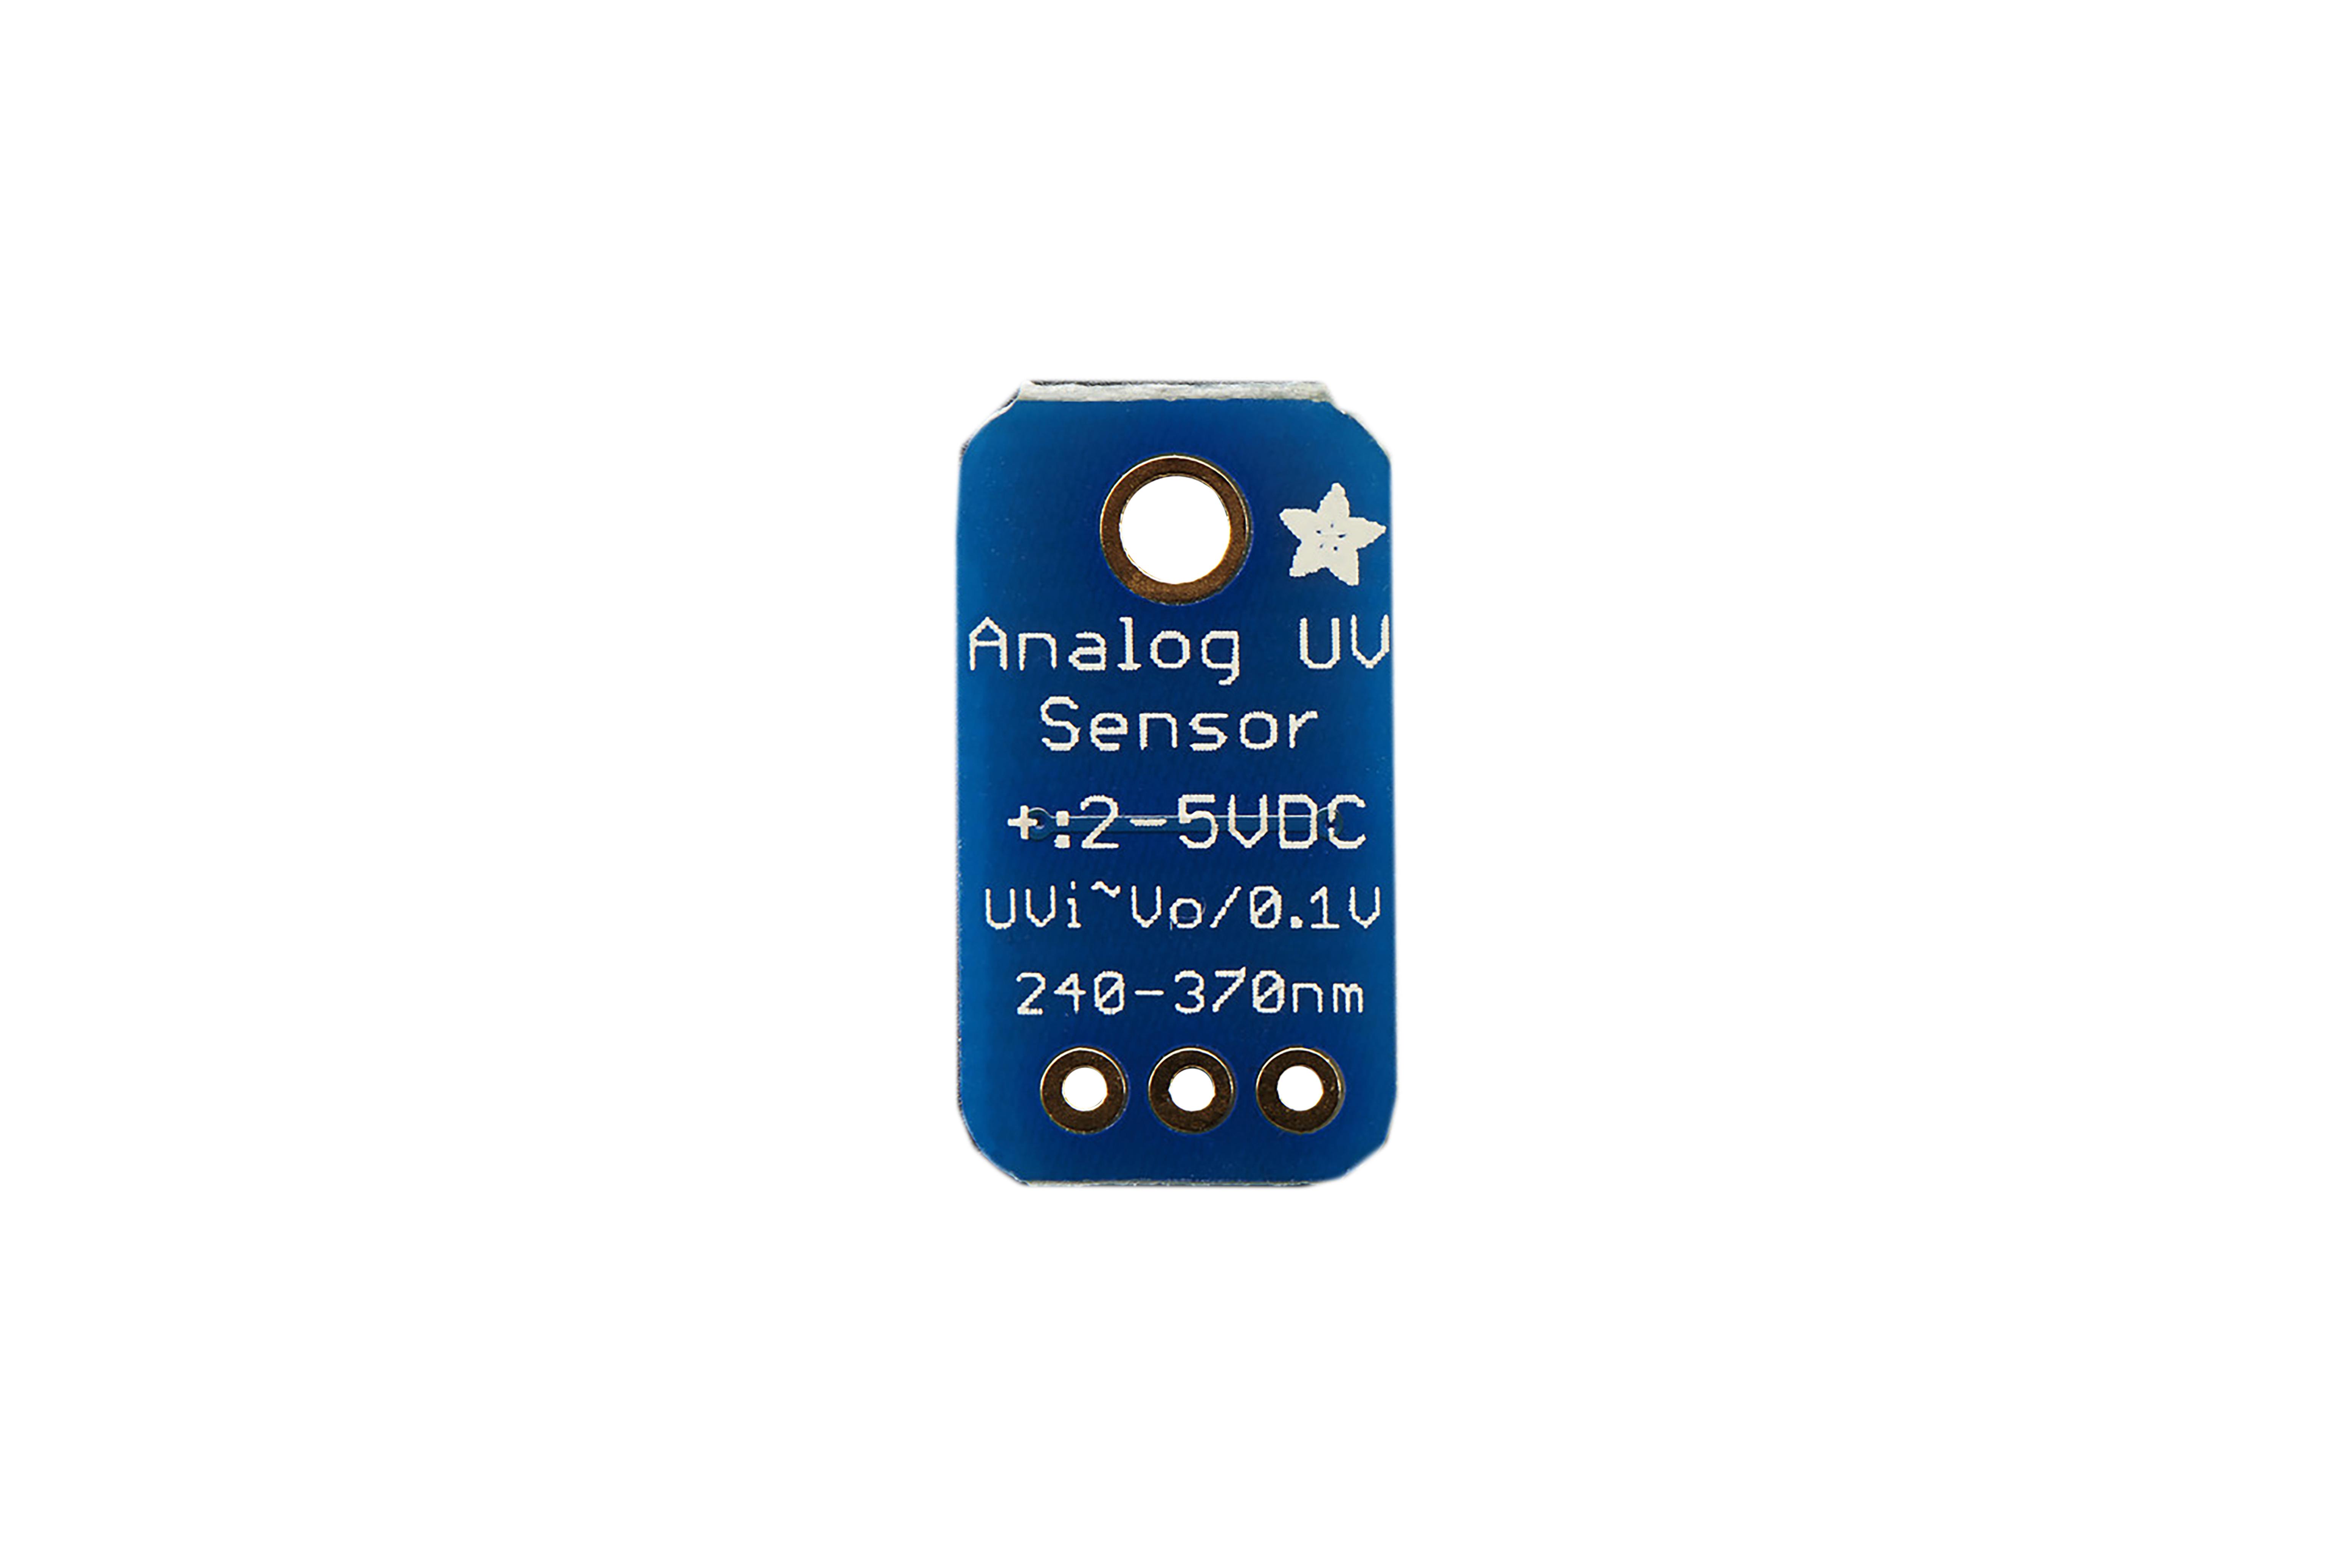 Adafruit(アダフルーツ) UV光センサー ブレークアウトモジュール